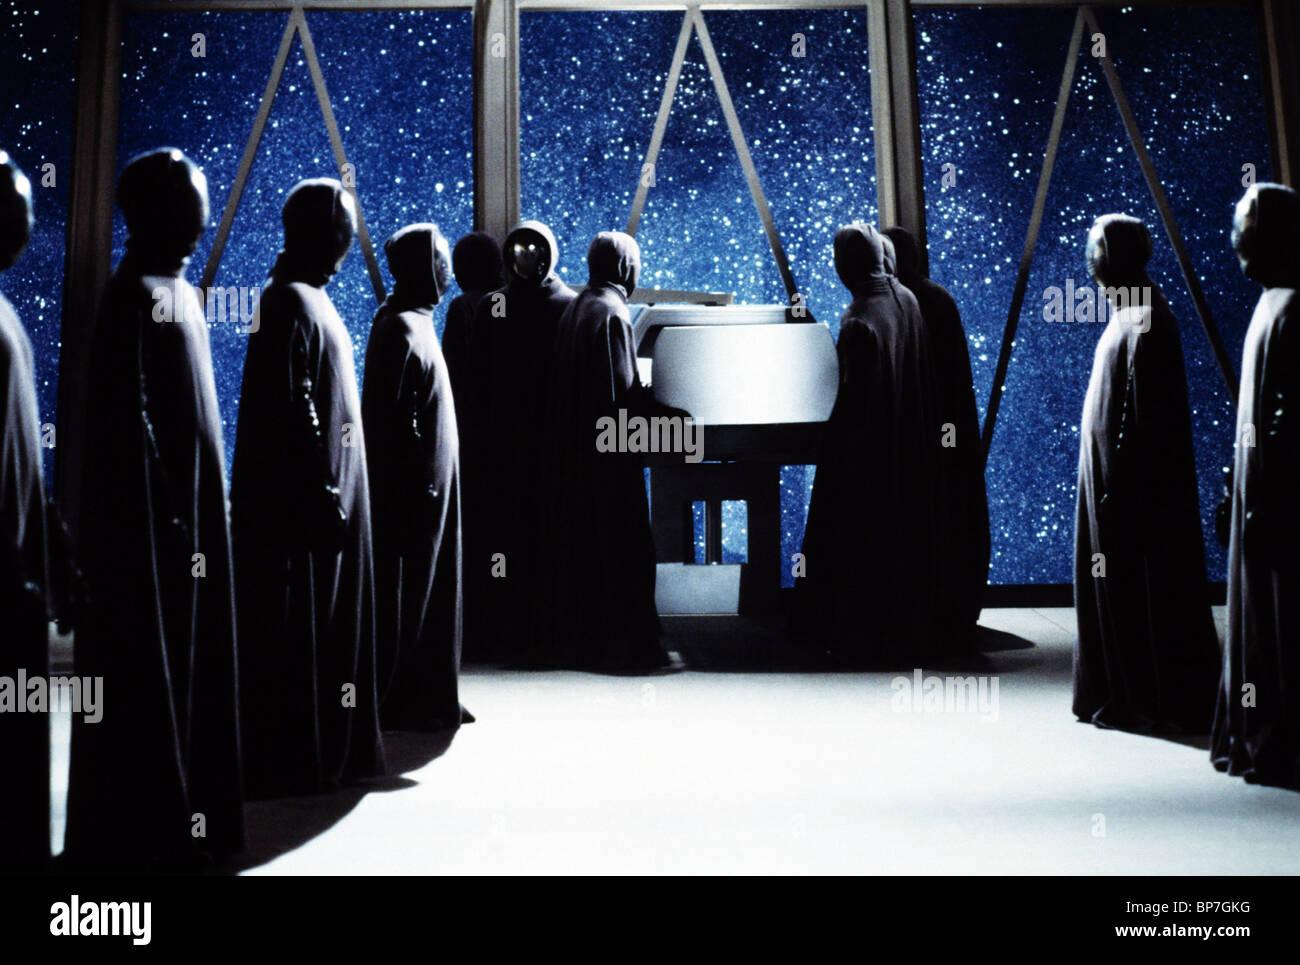 MOVIE SCENE THE BLACK HOLE (1979) - Stock Image